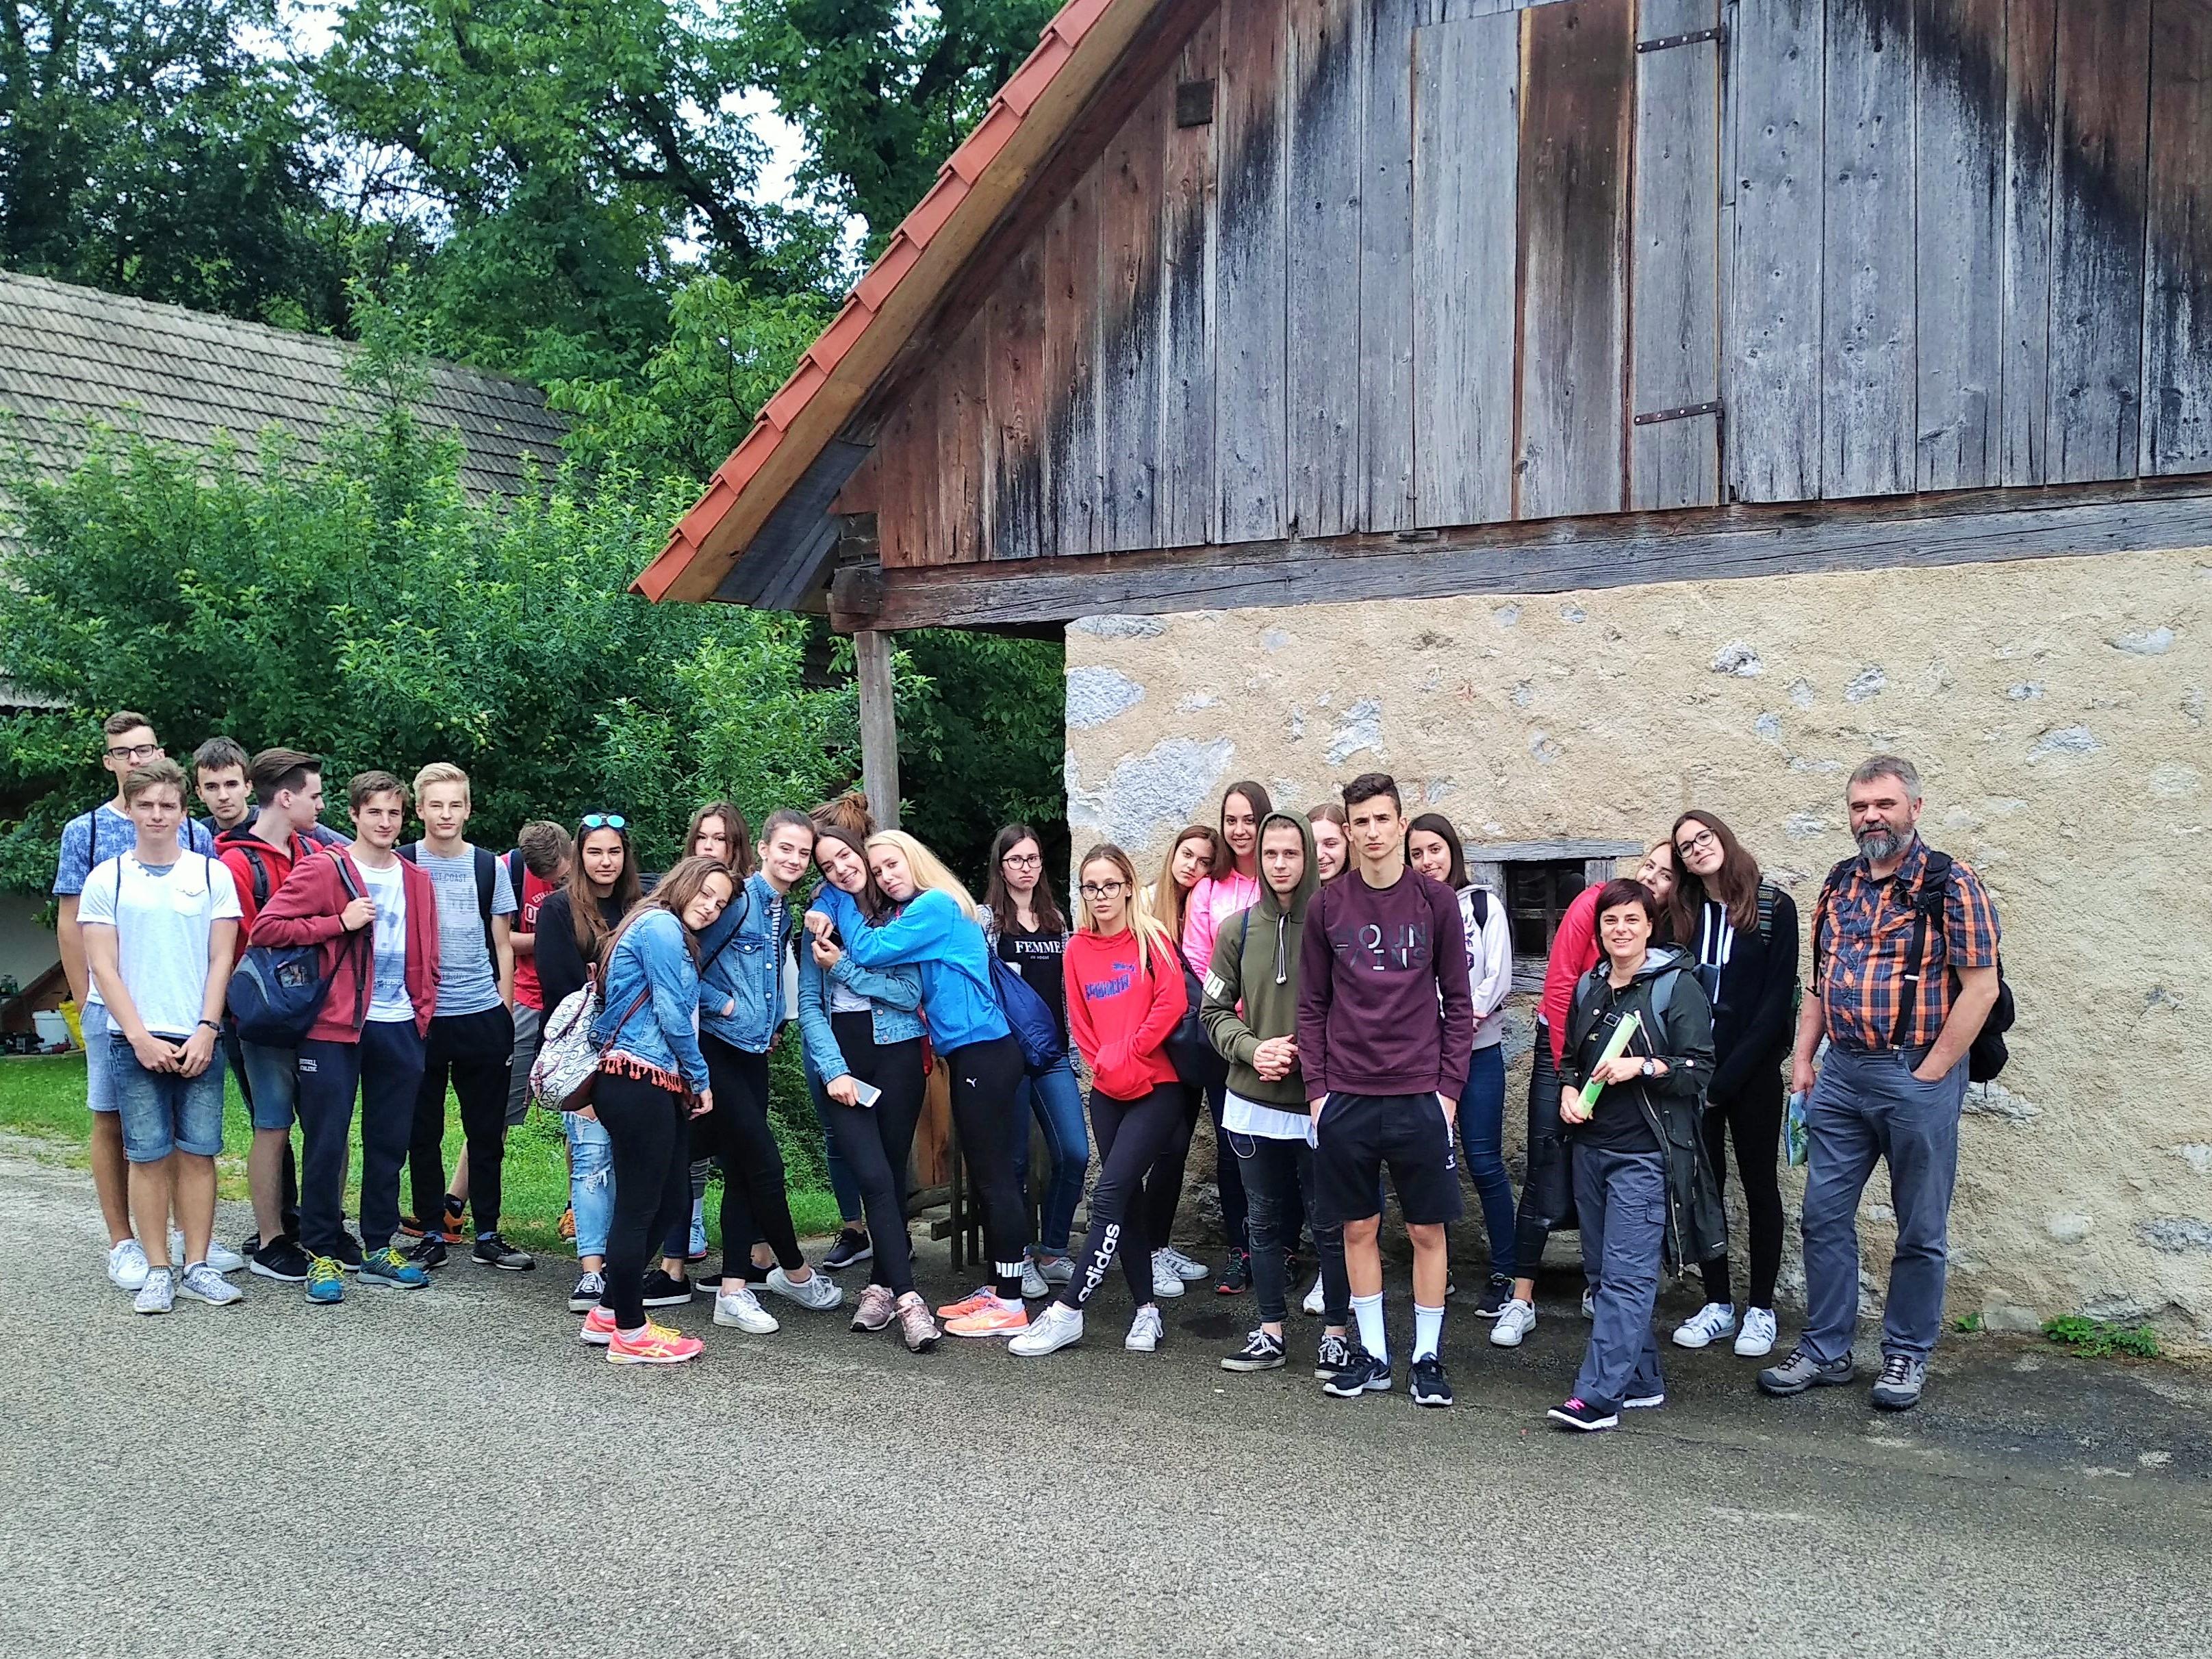 Ekskurzija Krajinski park Lahinja in Aquatika Karlovec